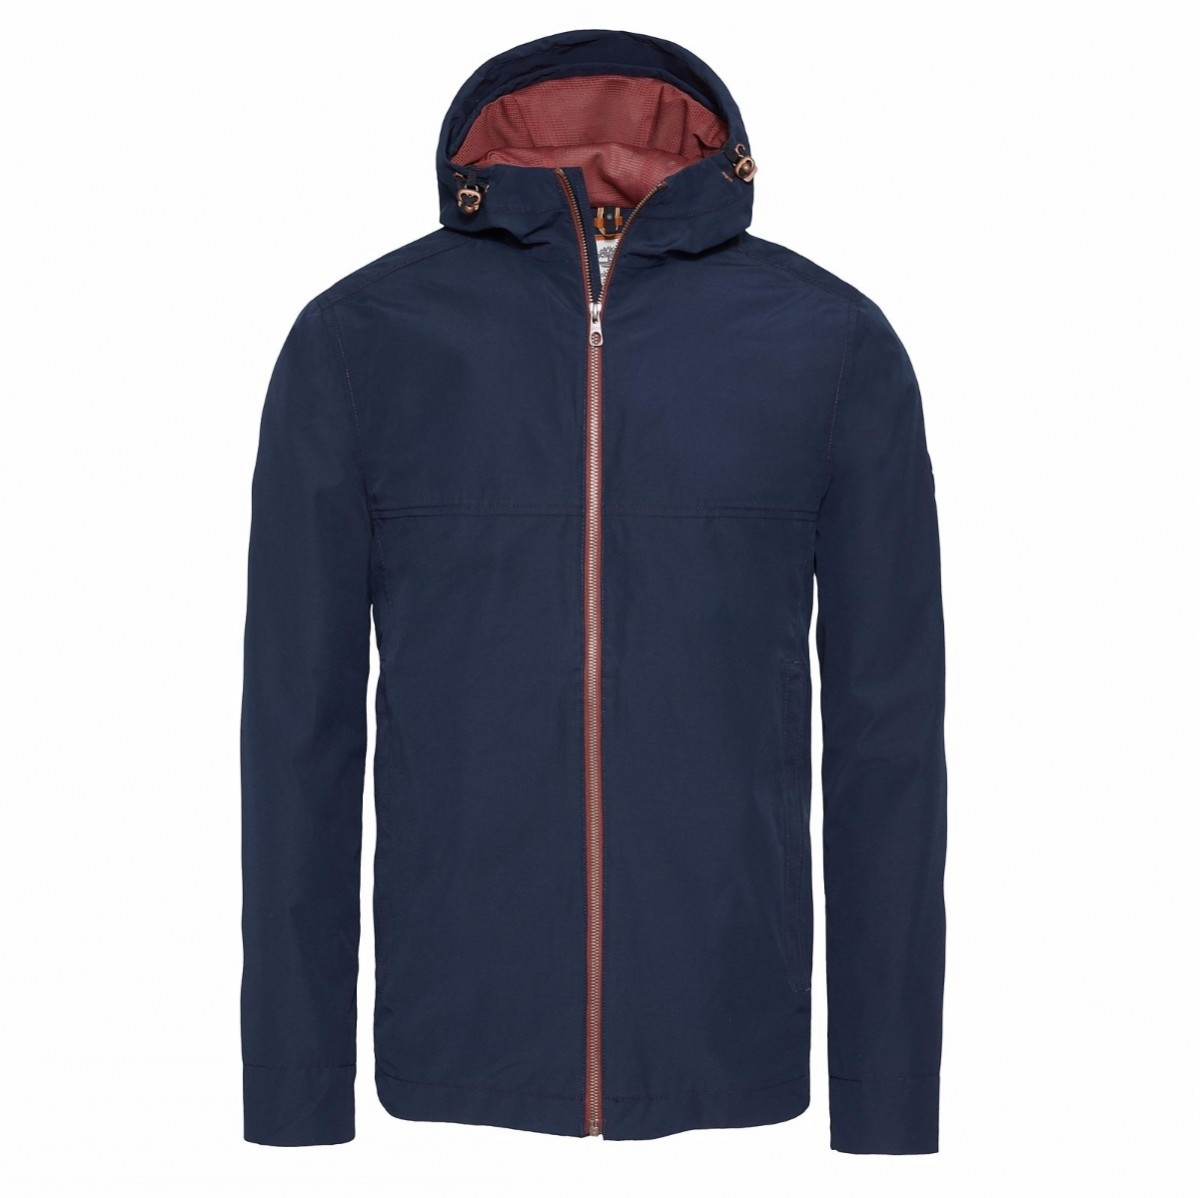 Timberland Ragged Mountain Packable Jacket Herren Jacke blau